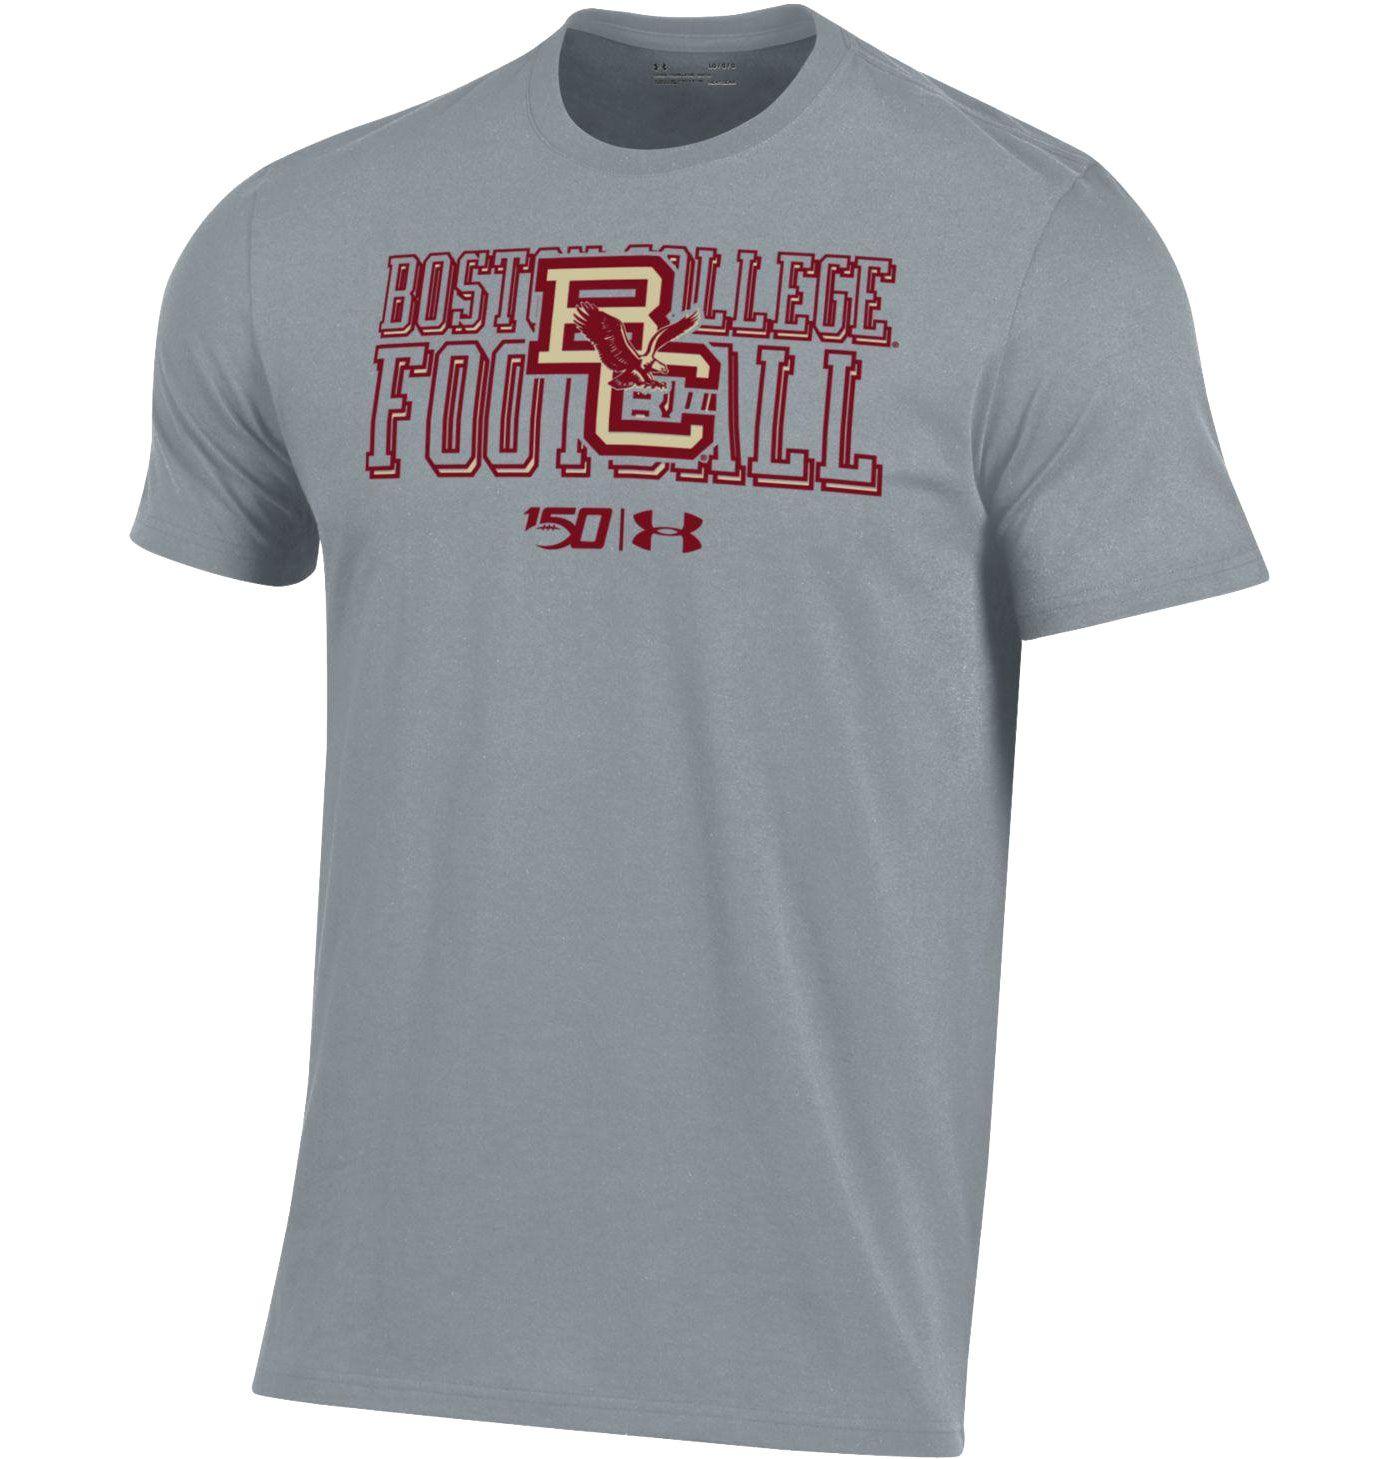 Under Armour Men's Boston College Eagles Grey 'CFB150' Performance Cotton Football T-Shirt